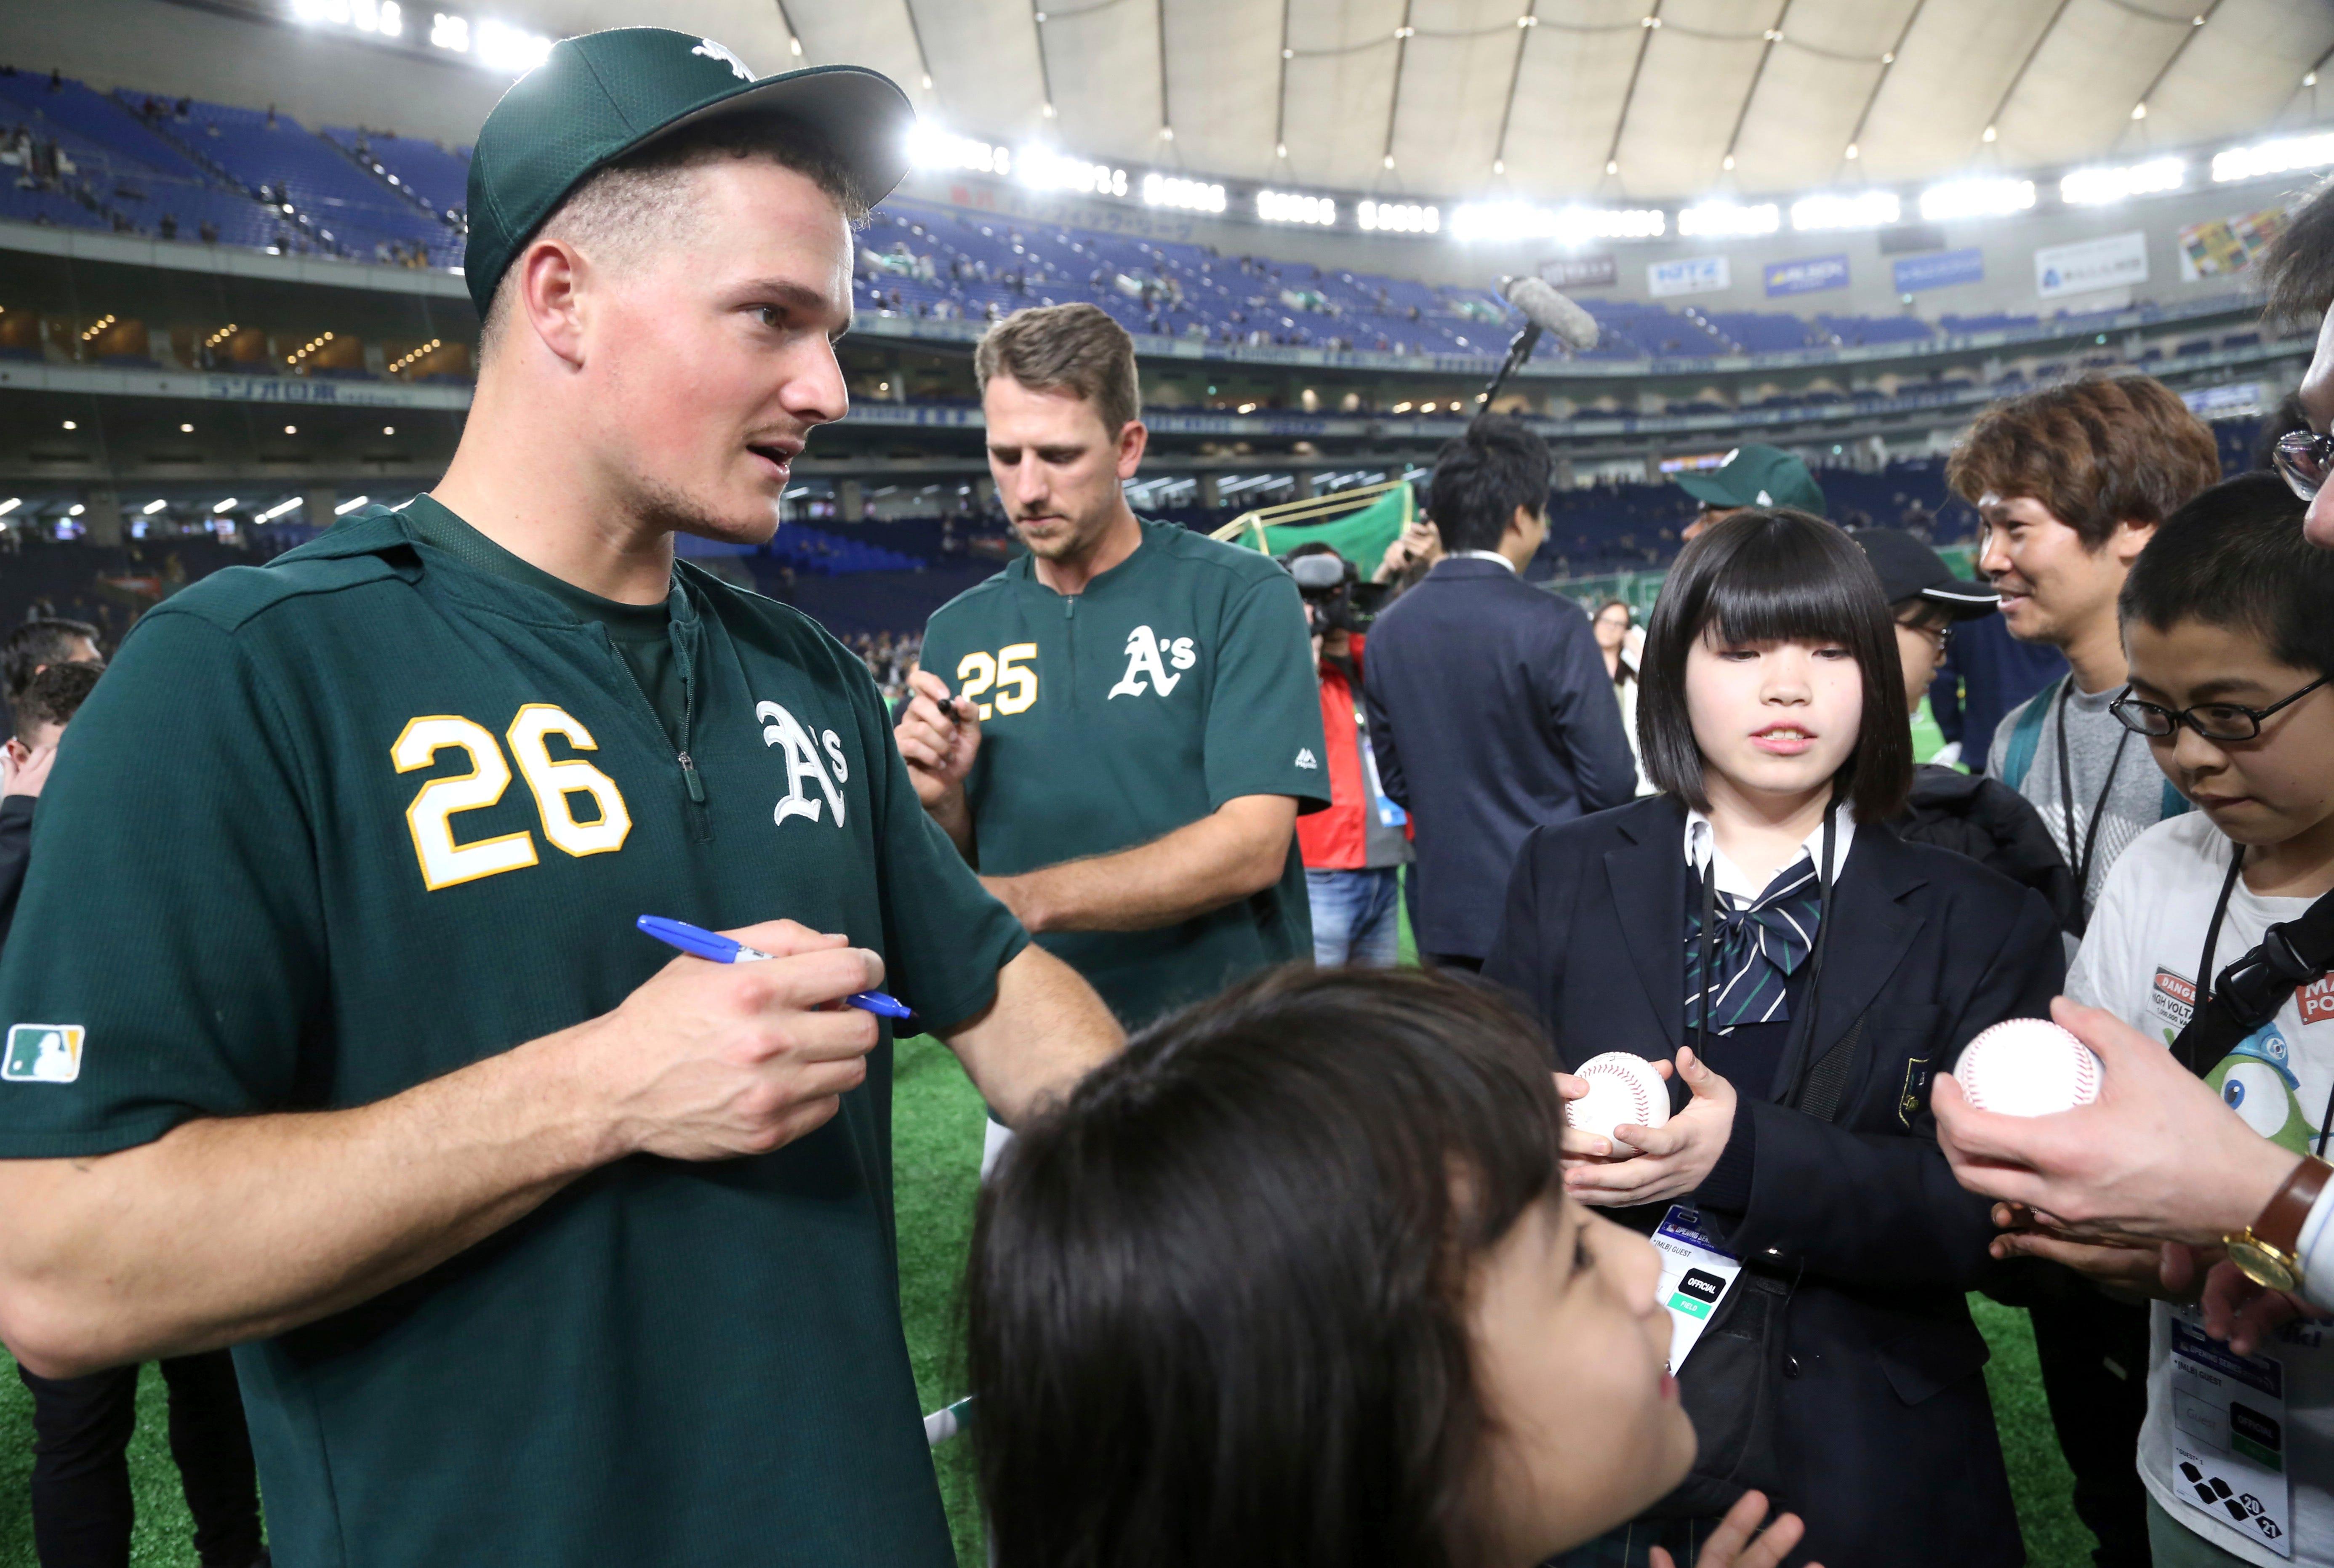 Bruce gets 1st hit of 2019 MLB season, Piscotty 1st home run